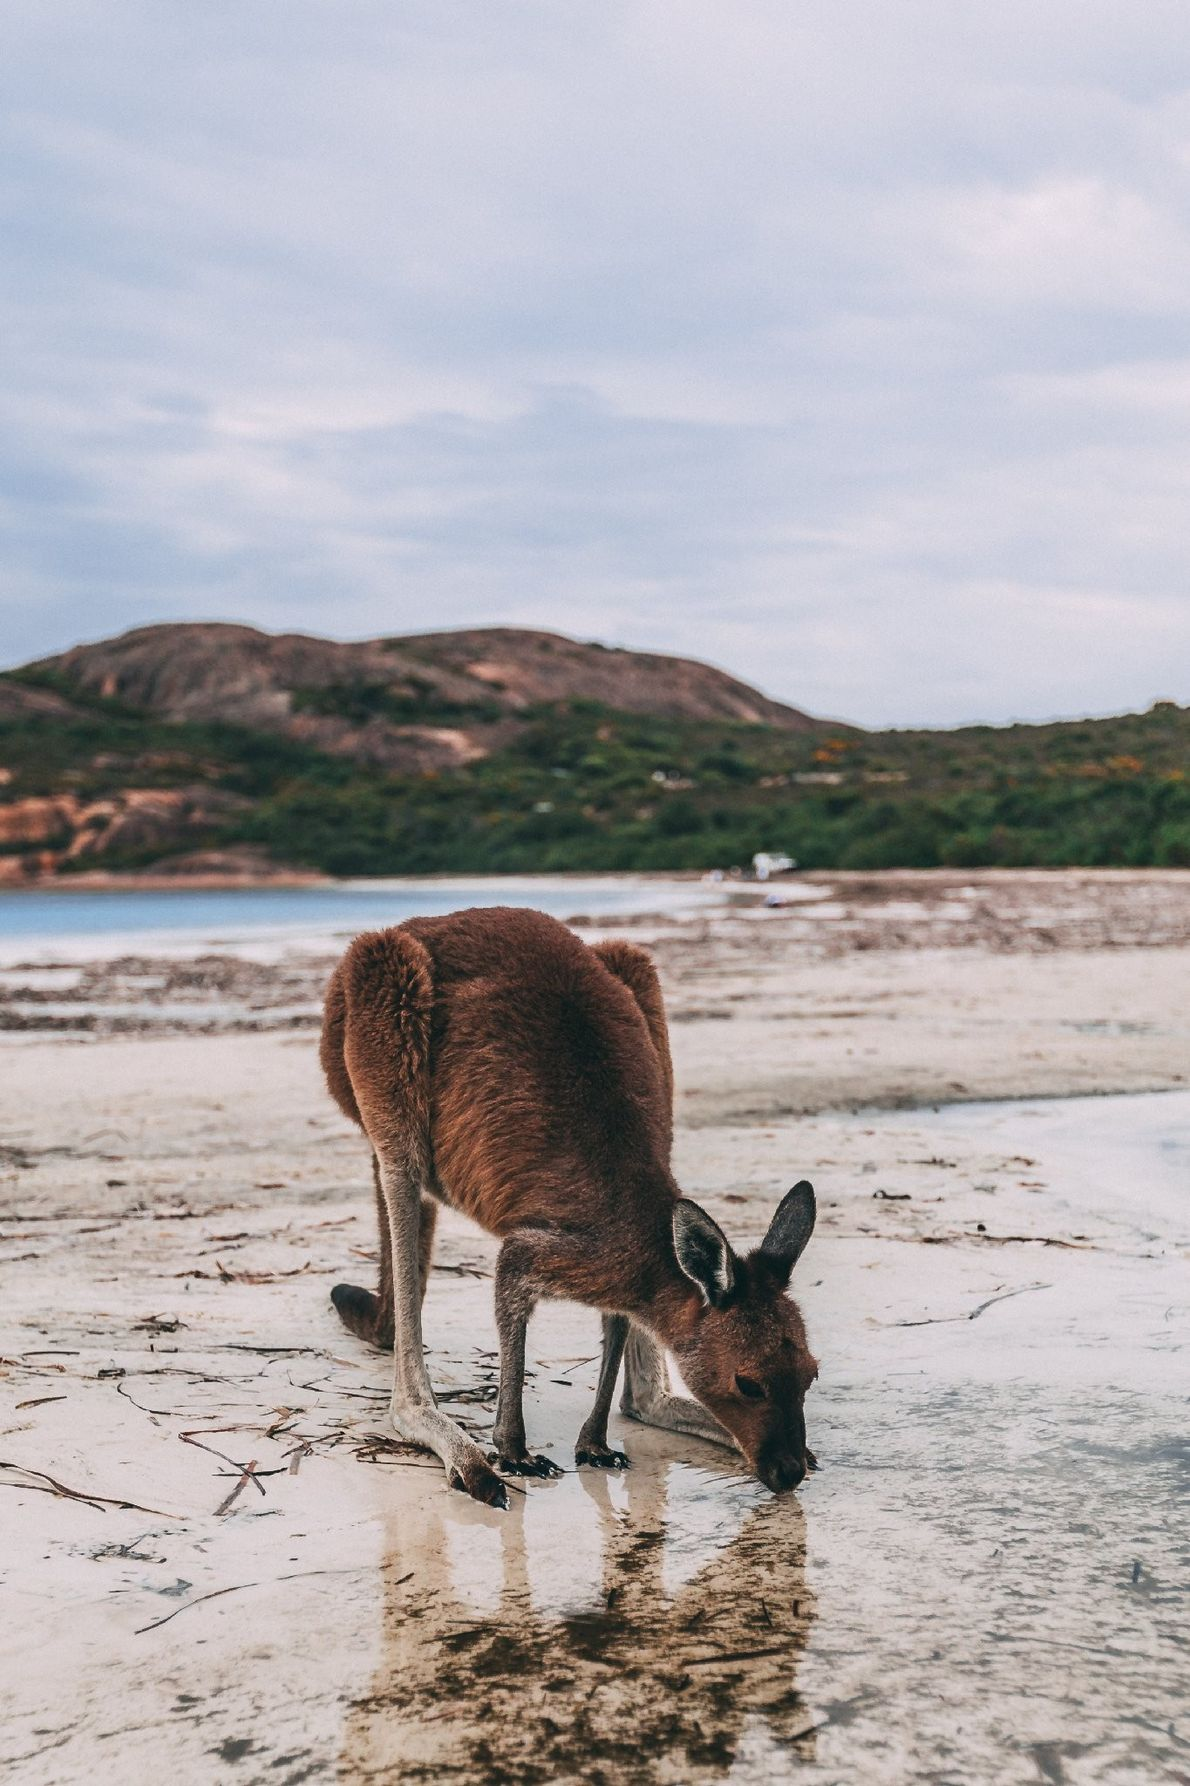 Your Shot photographer Christina Zito captured this photo of a kangaroo at Lucky Bay in Esperance, ...